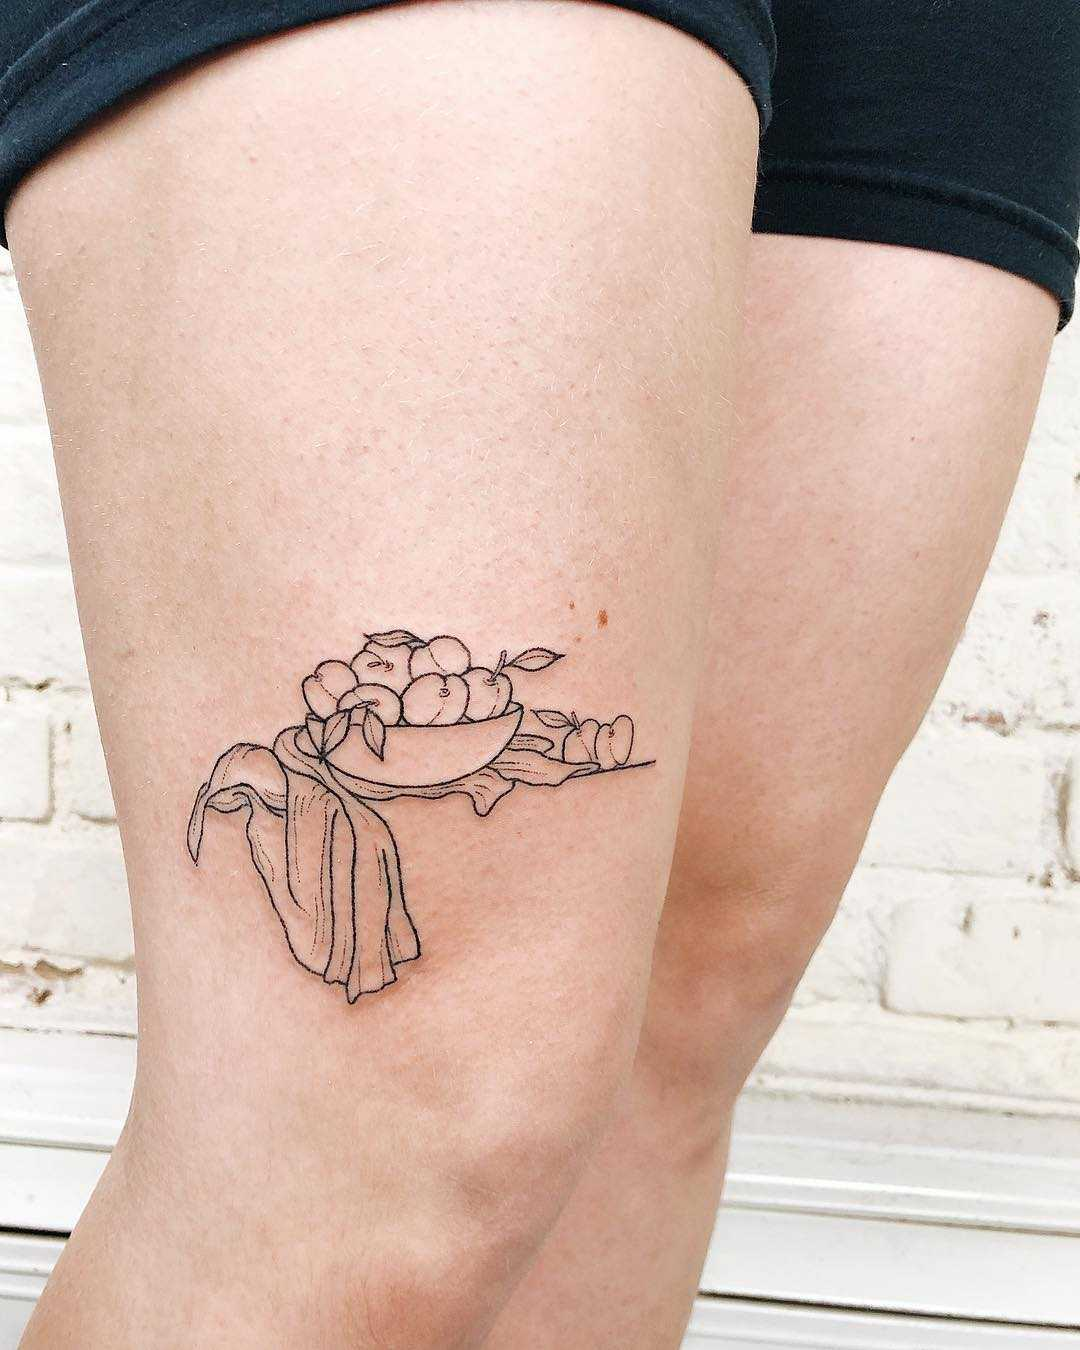 Fruit bowl tattoo by Kelli Kikcio